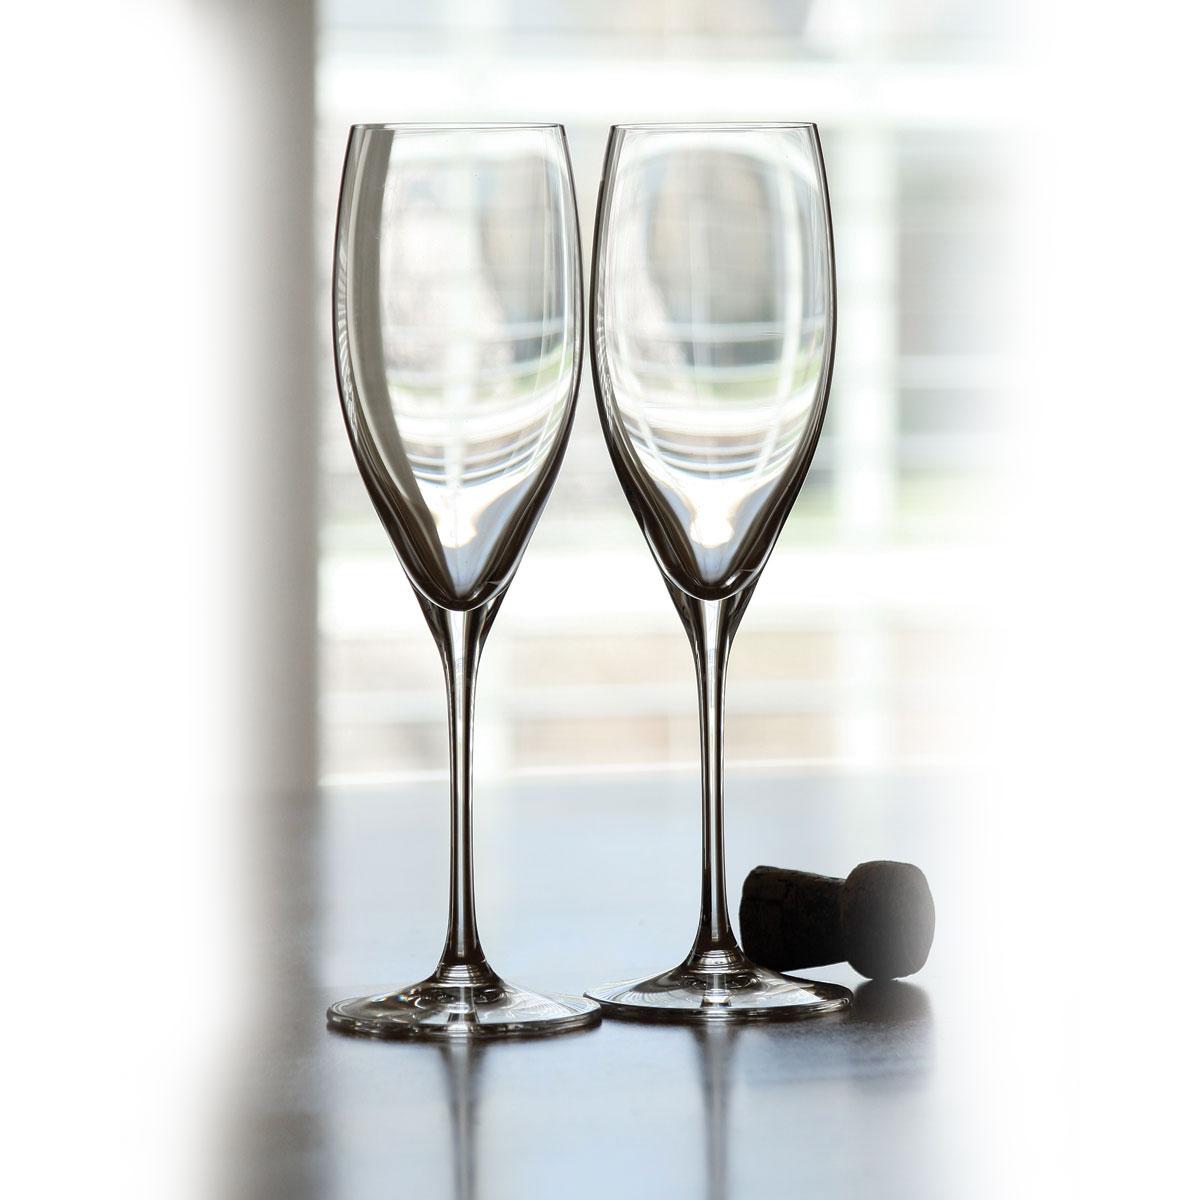 Riedel Vinum, Cuvee Prestige Glasses, Pair